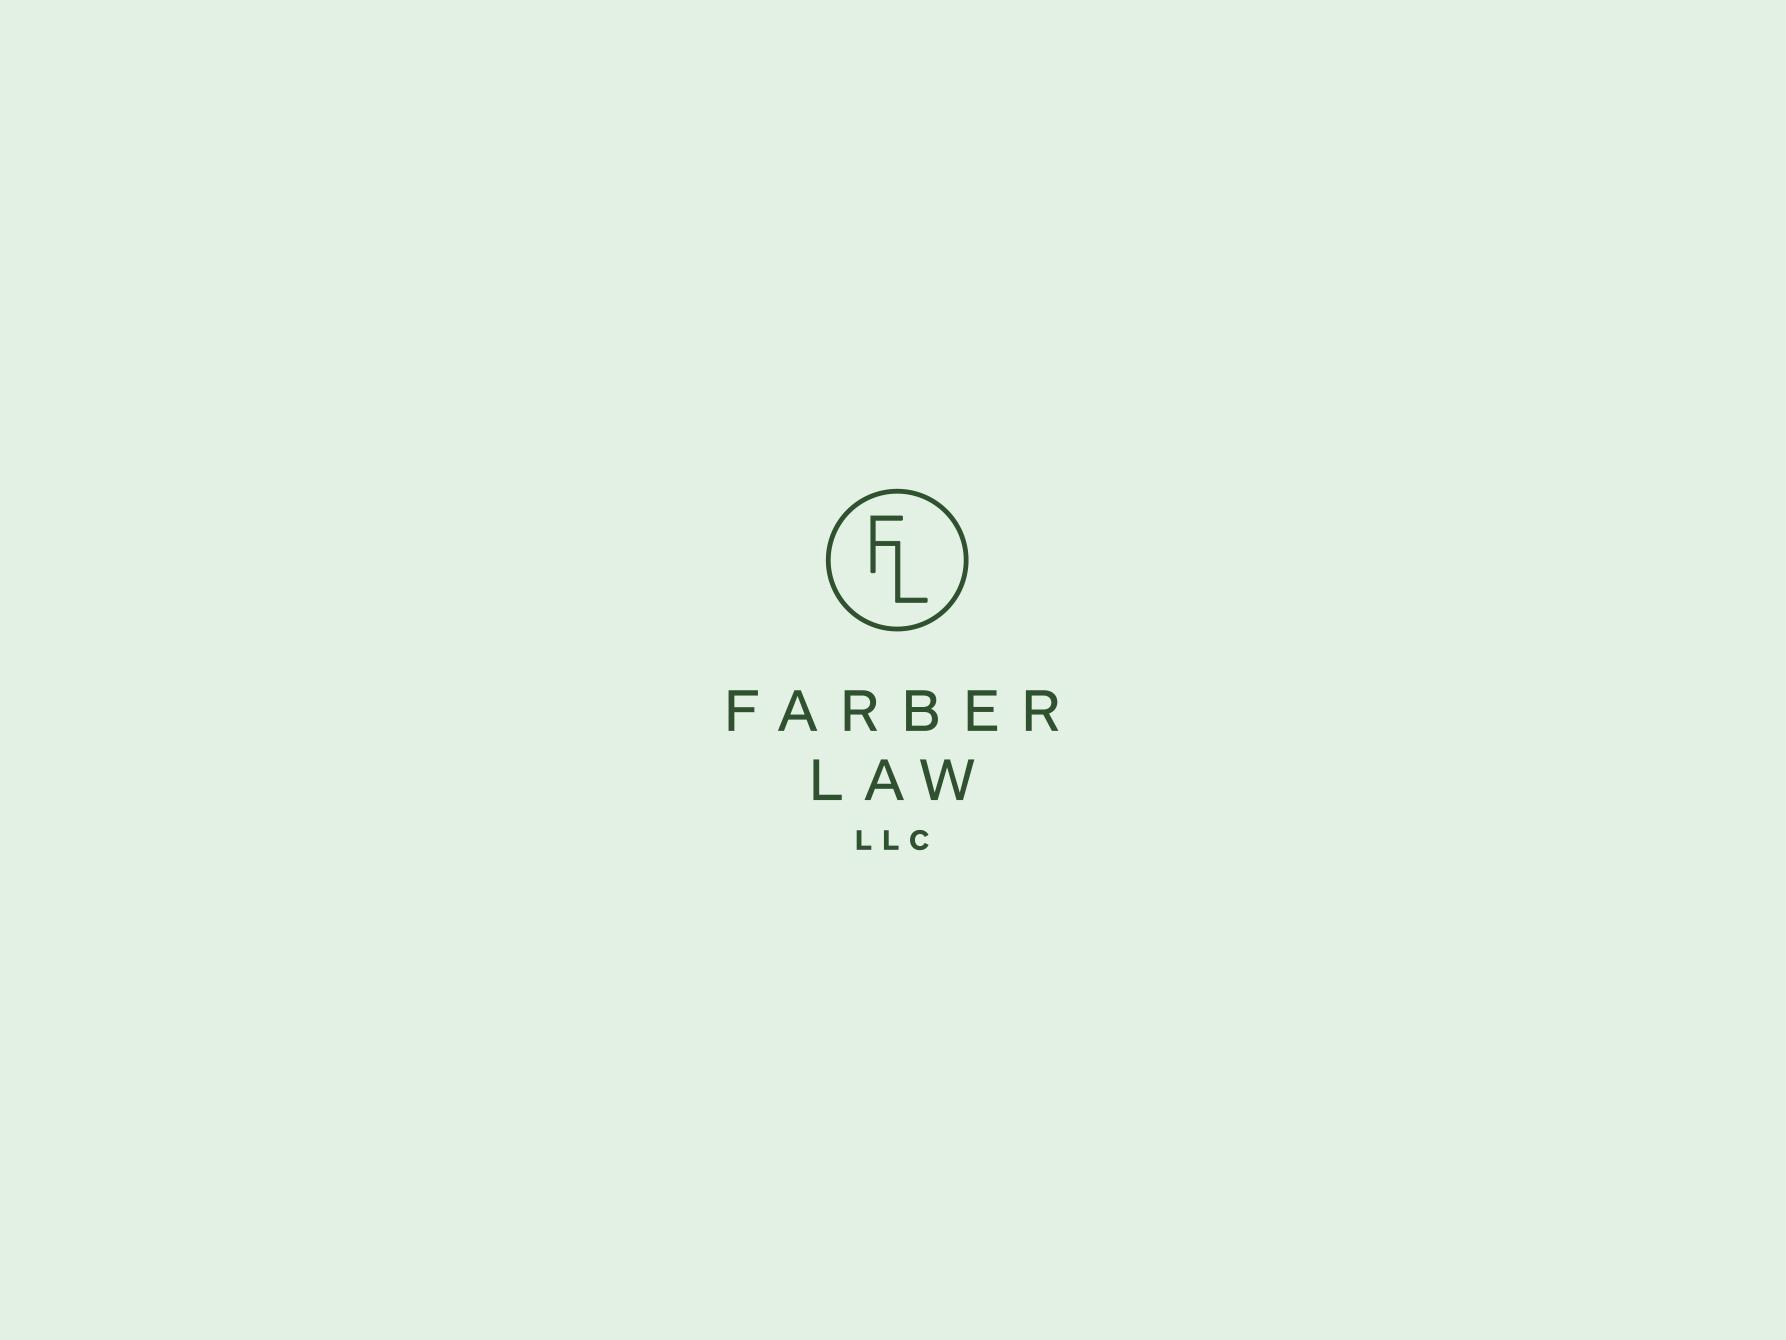 Farber-2.jpg